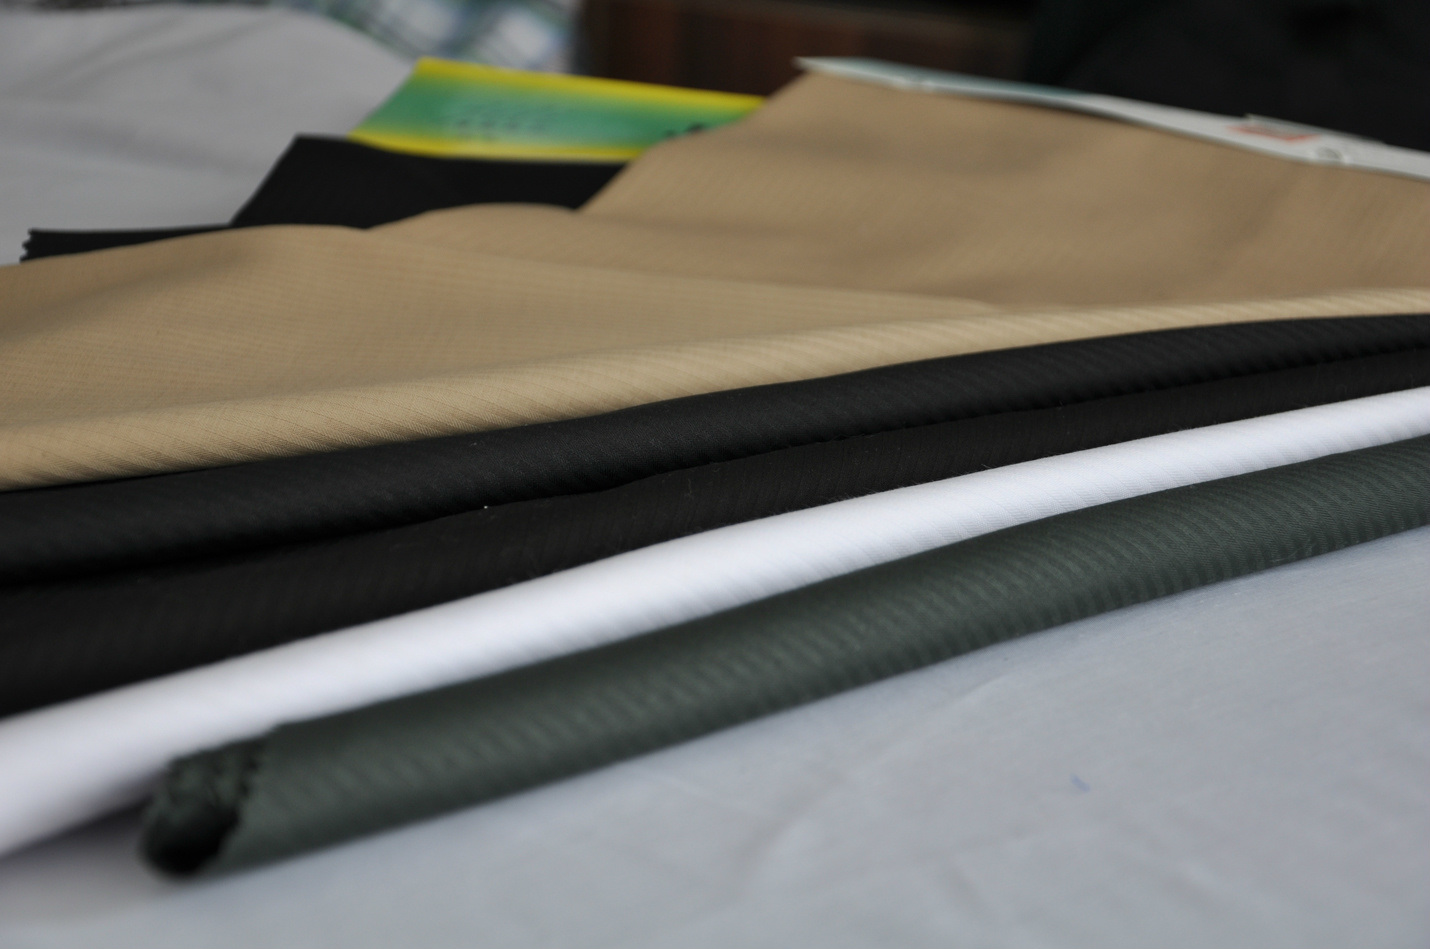 100% Polyester / Lining / Herringbone Fabric